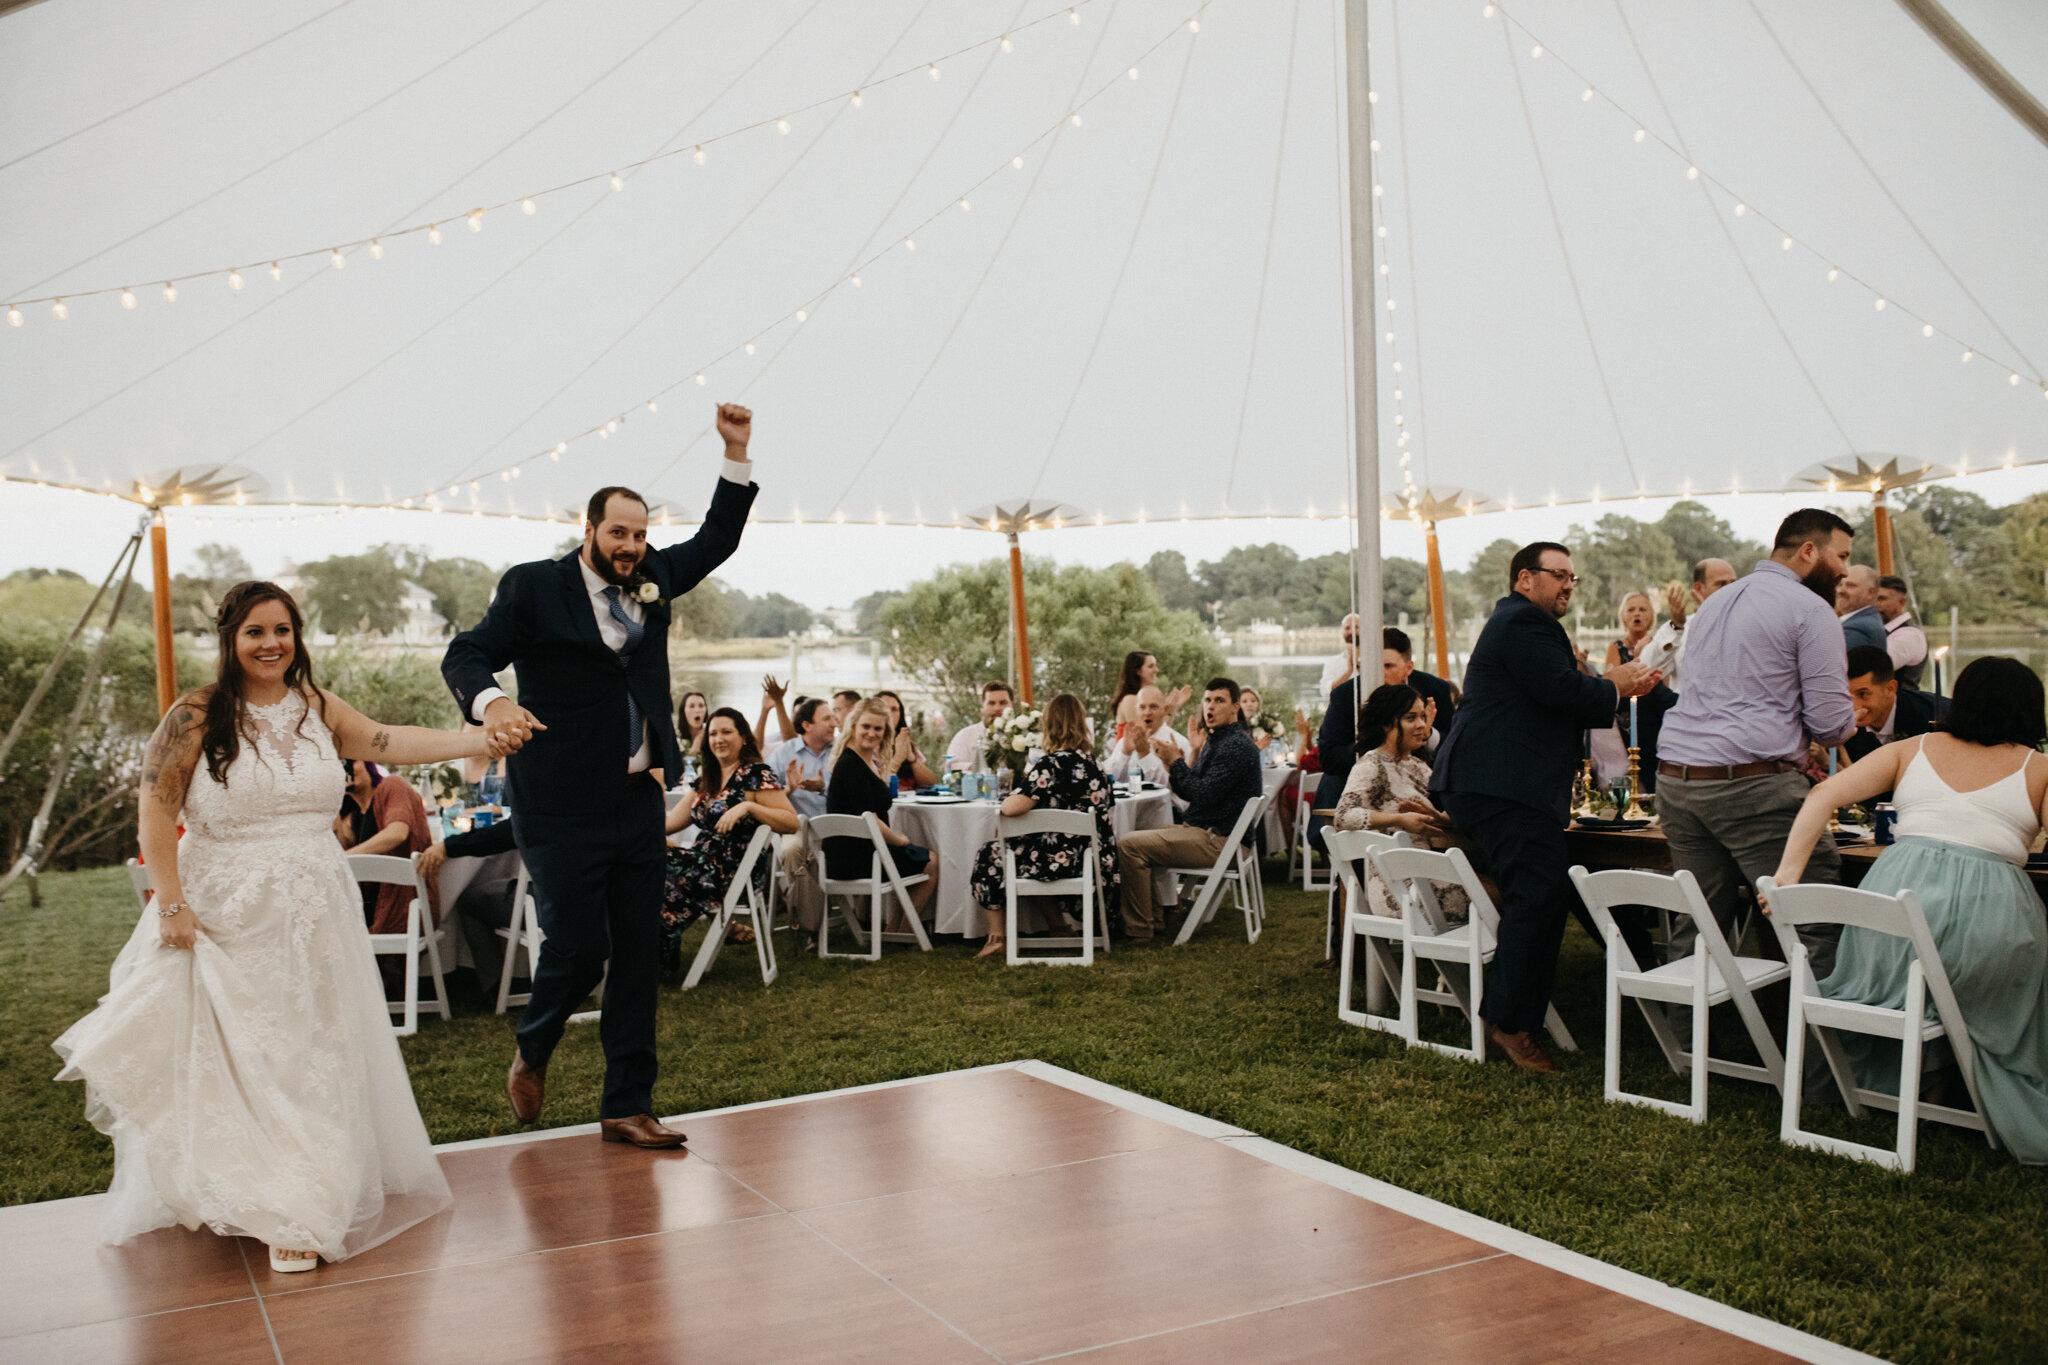 angela_jason_norfolk_wedding-143.jpg